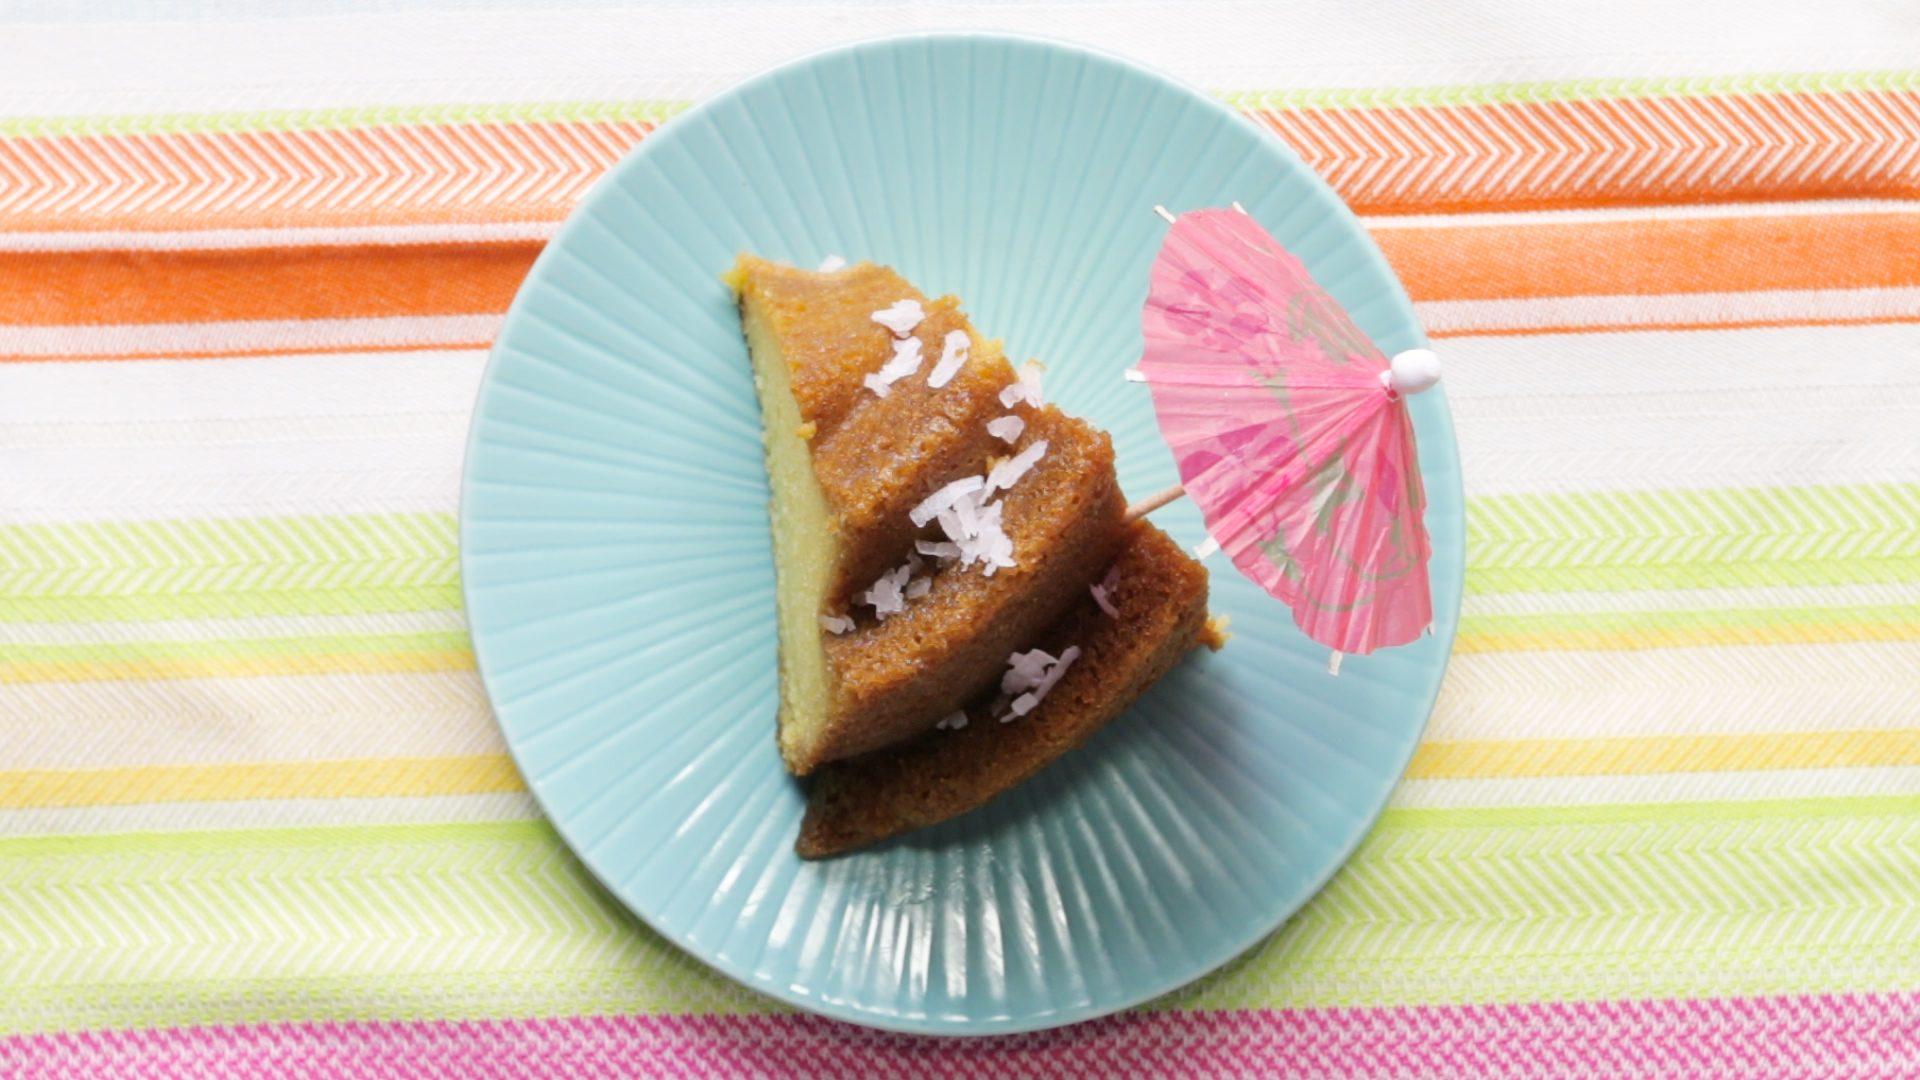 Watch Us Make: Caribbean Coconut Rum Poke Cake | Taste of Home